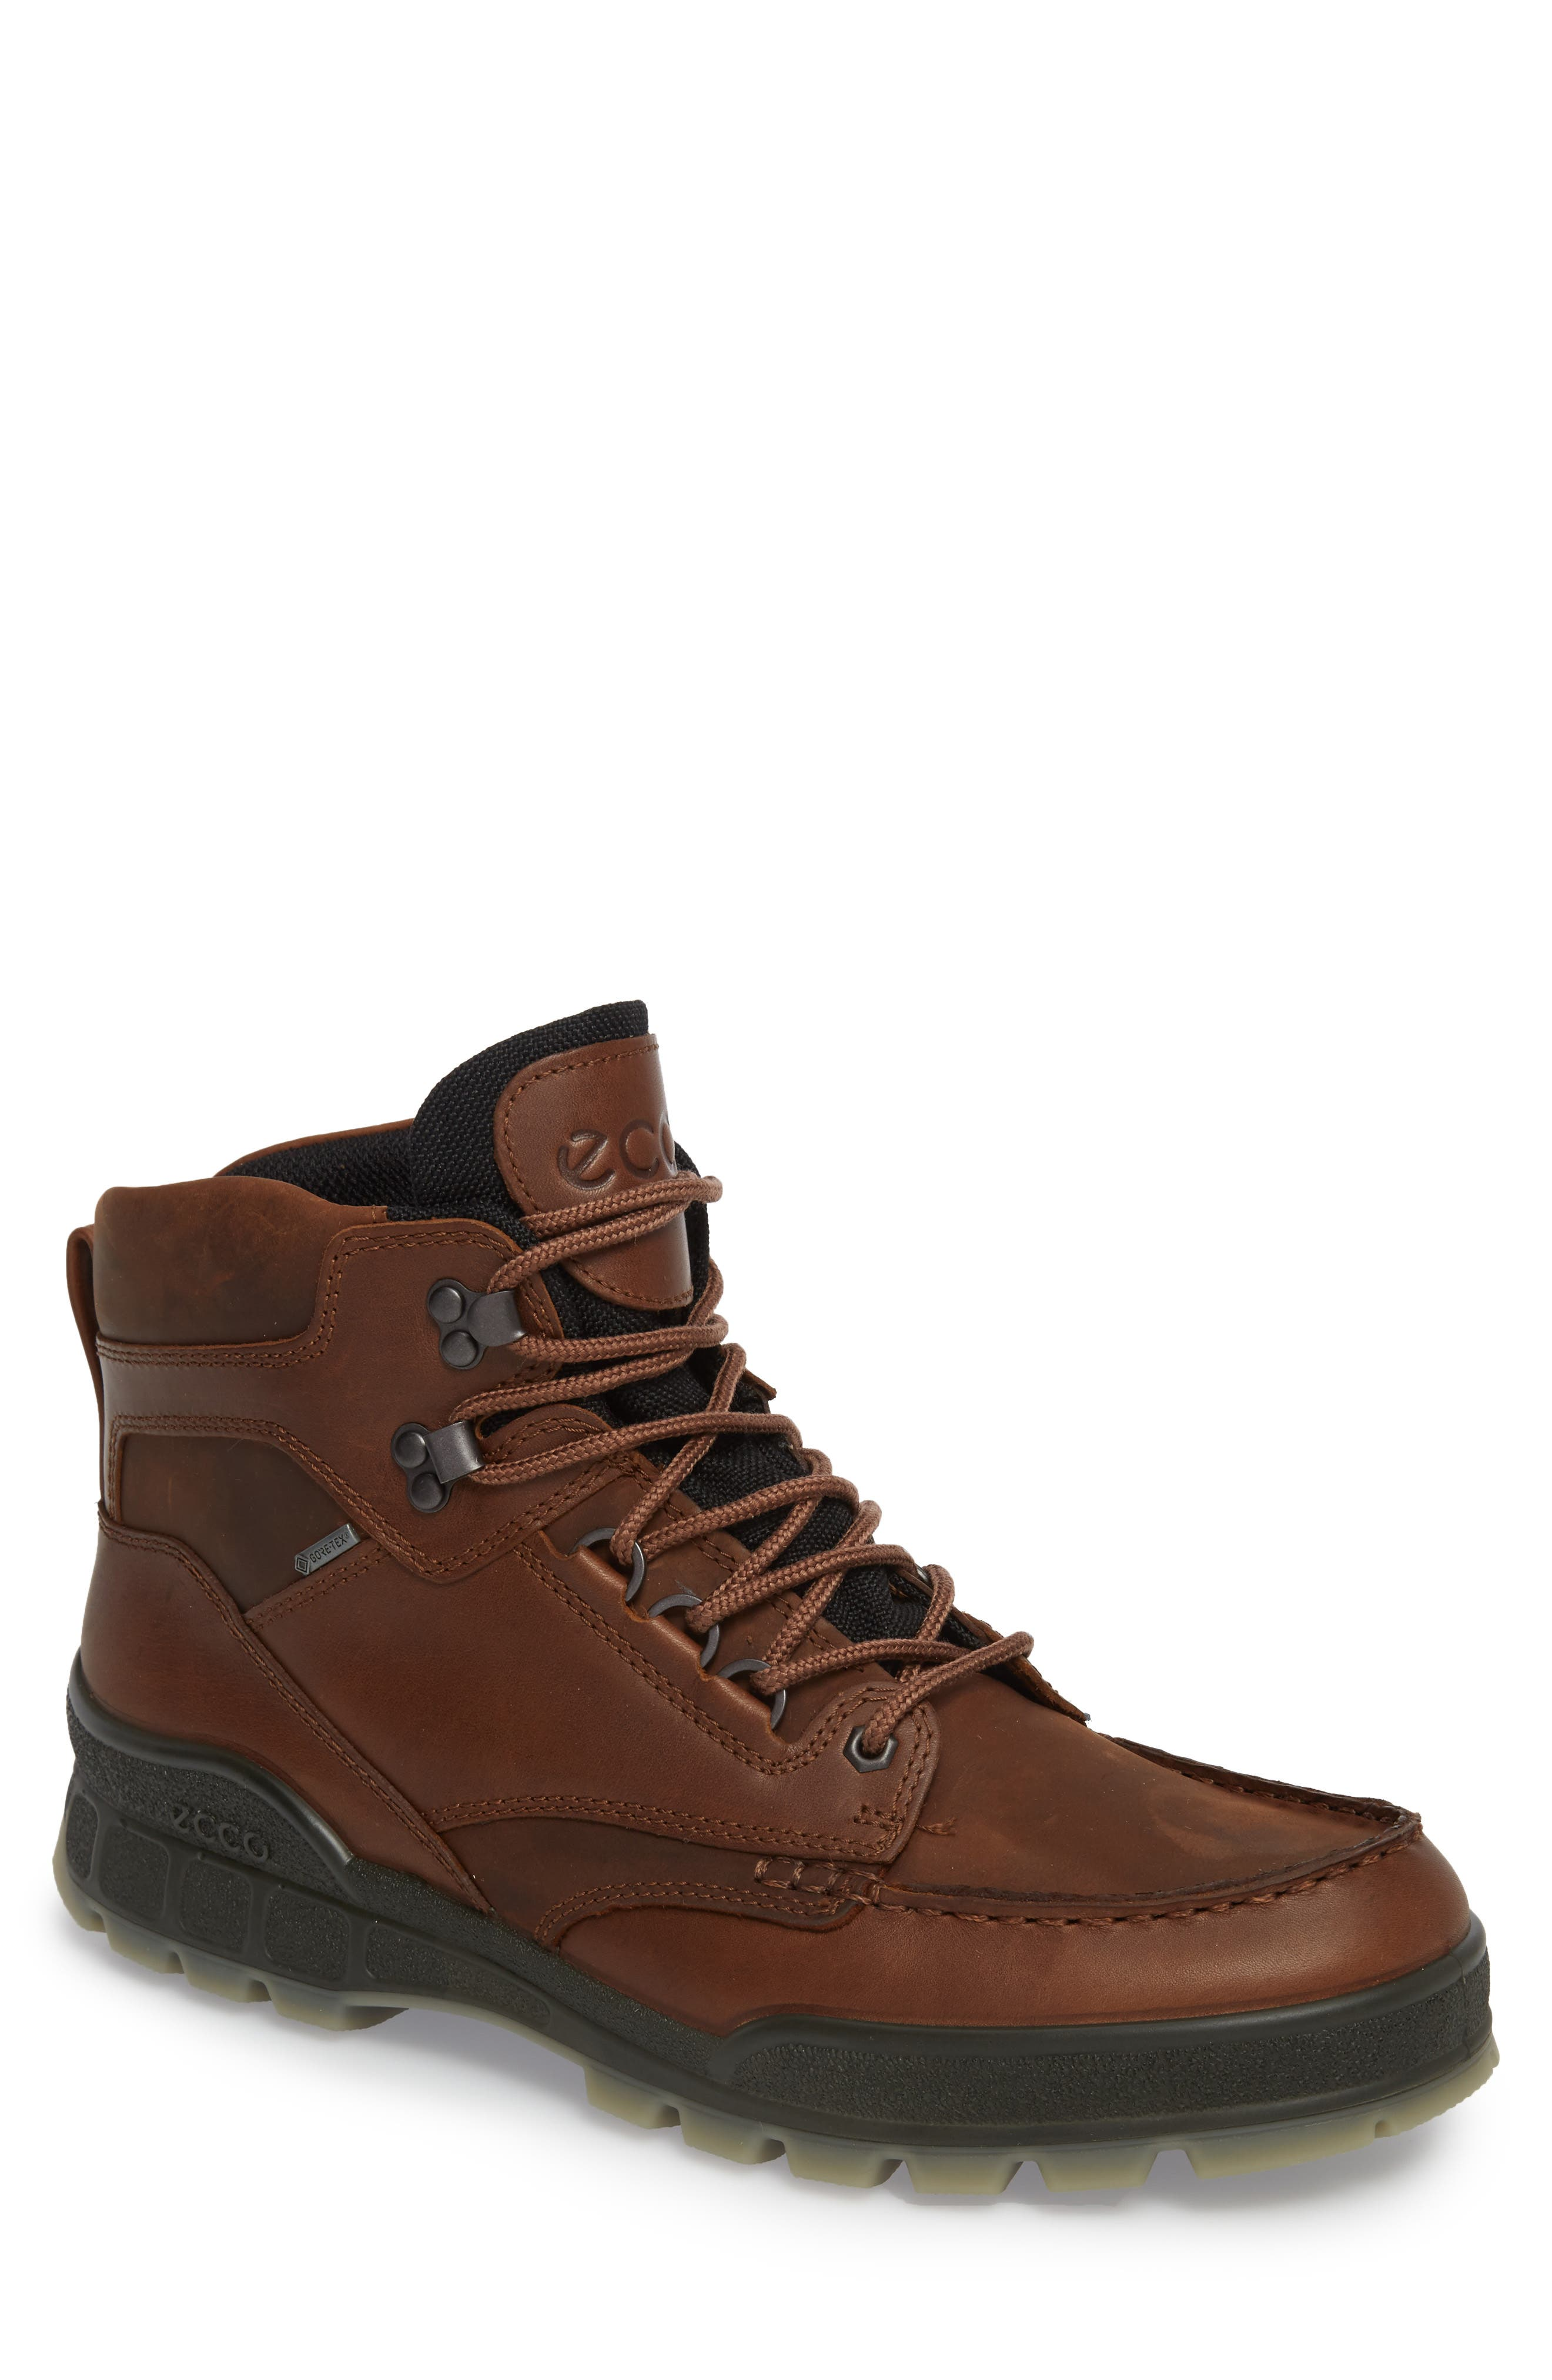 florsheim shoes bangalore weather in celsius